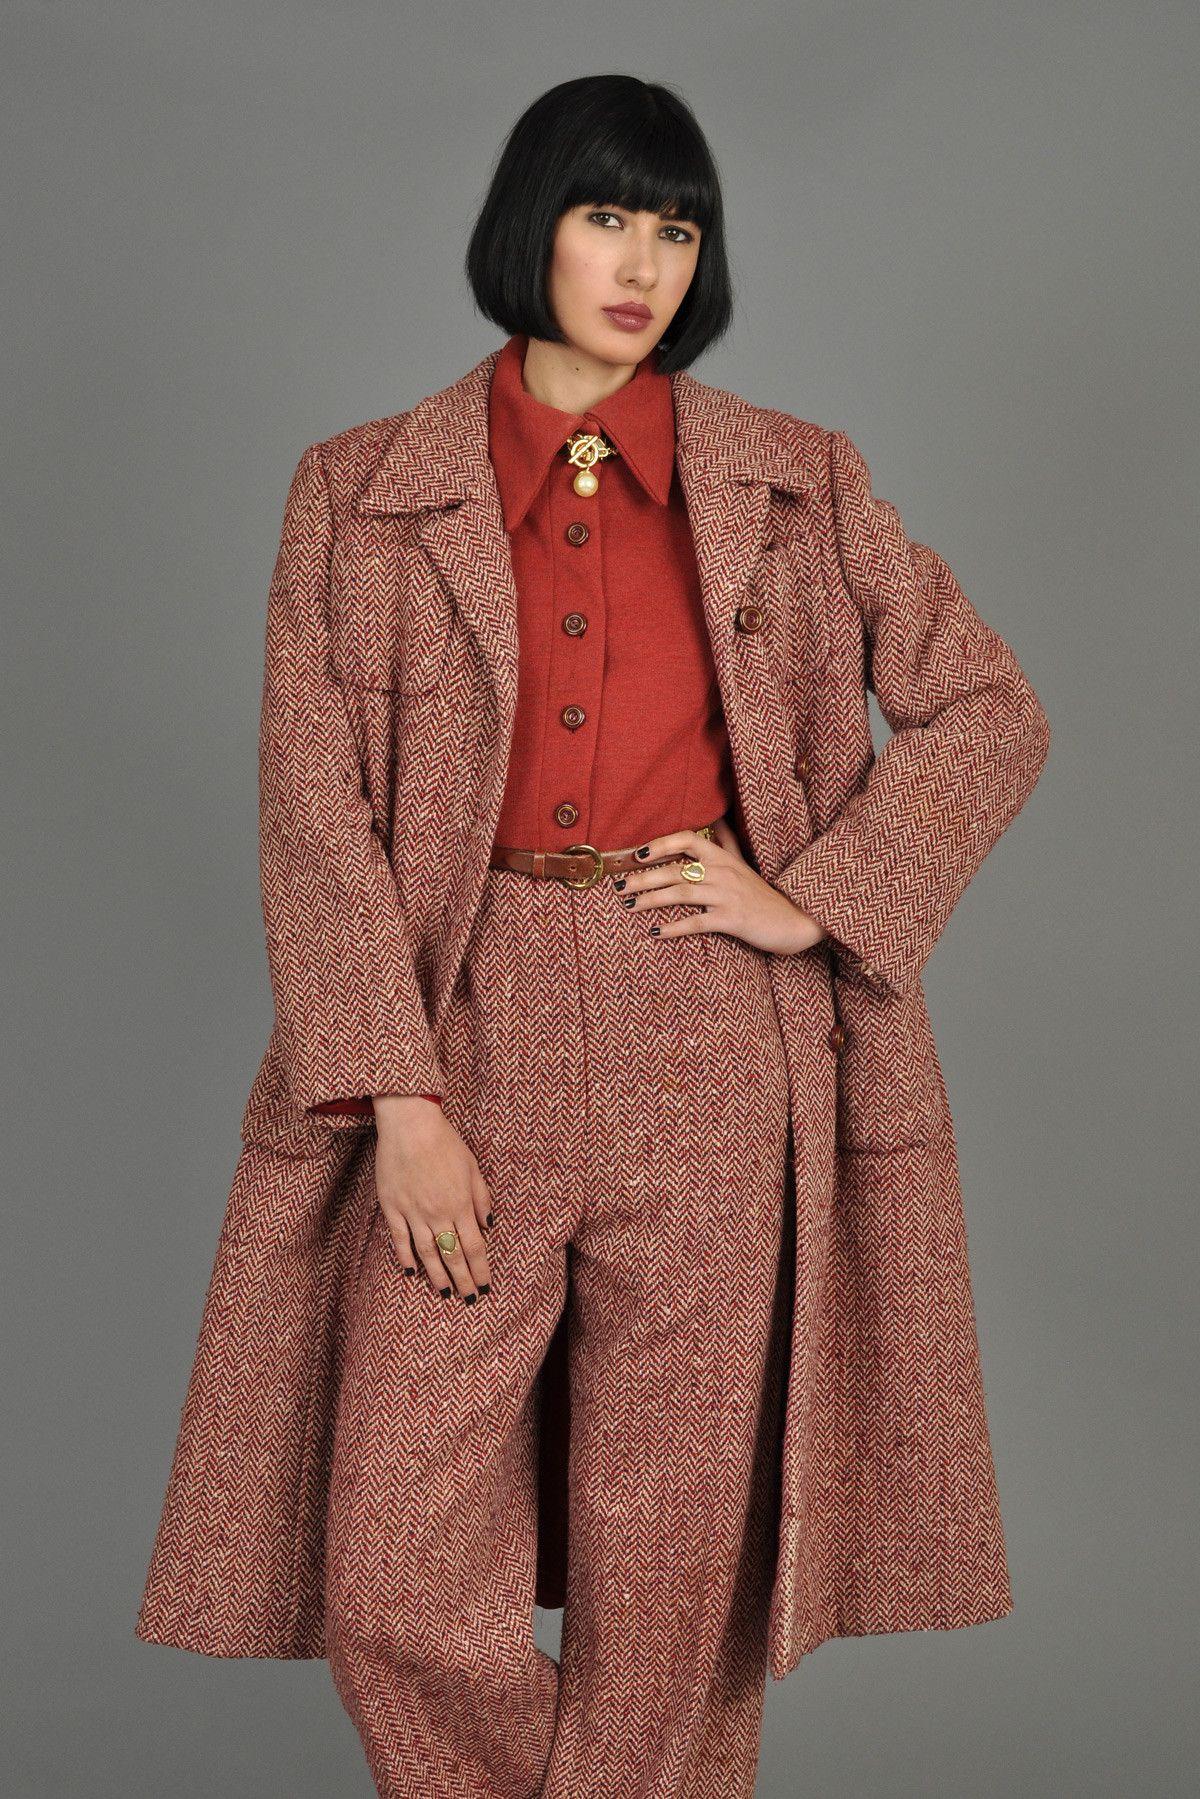 1970s 3-Piece Tweed Jumpsuit + Coat Ensemble | BUSTOWN MODERN